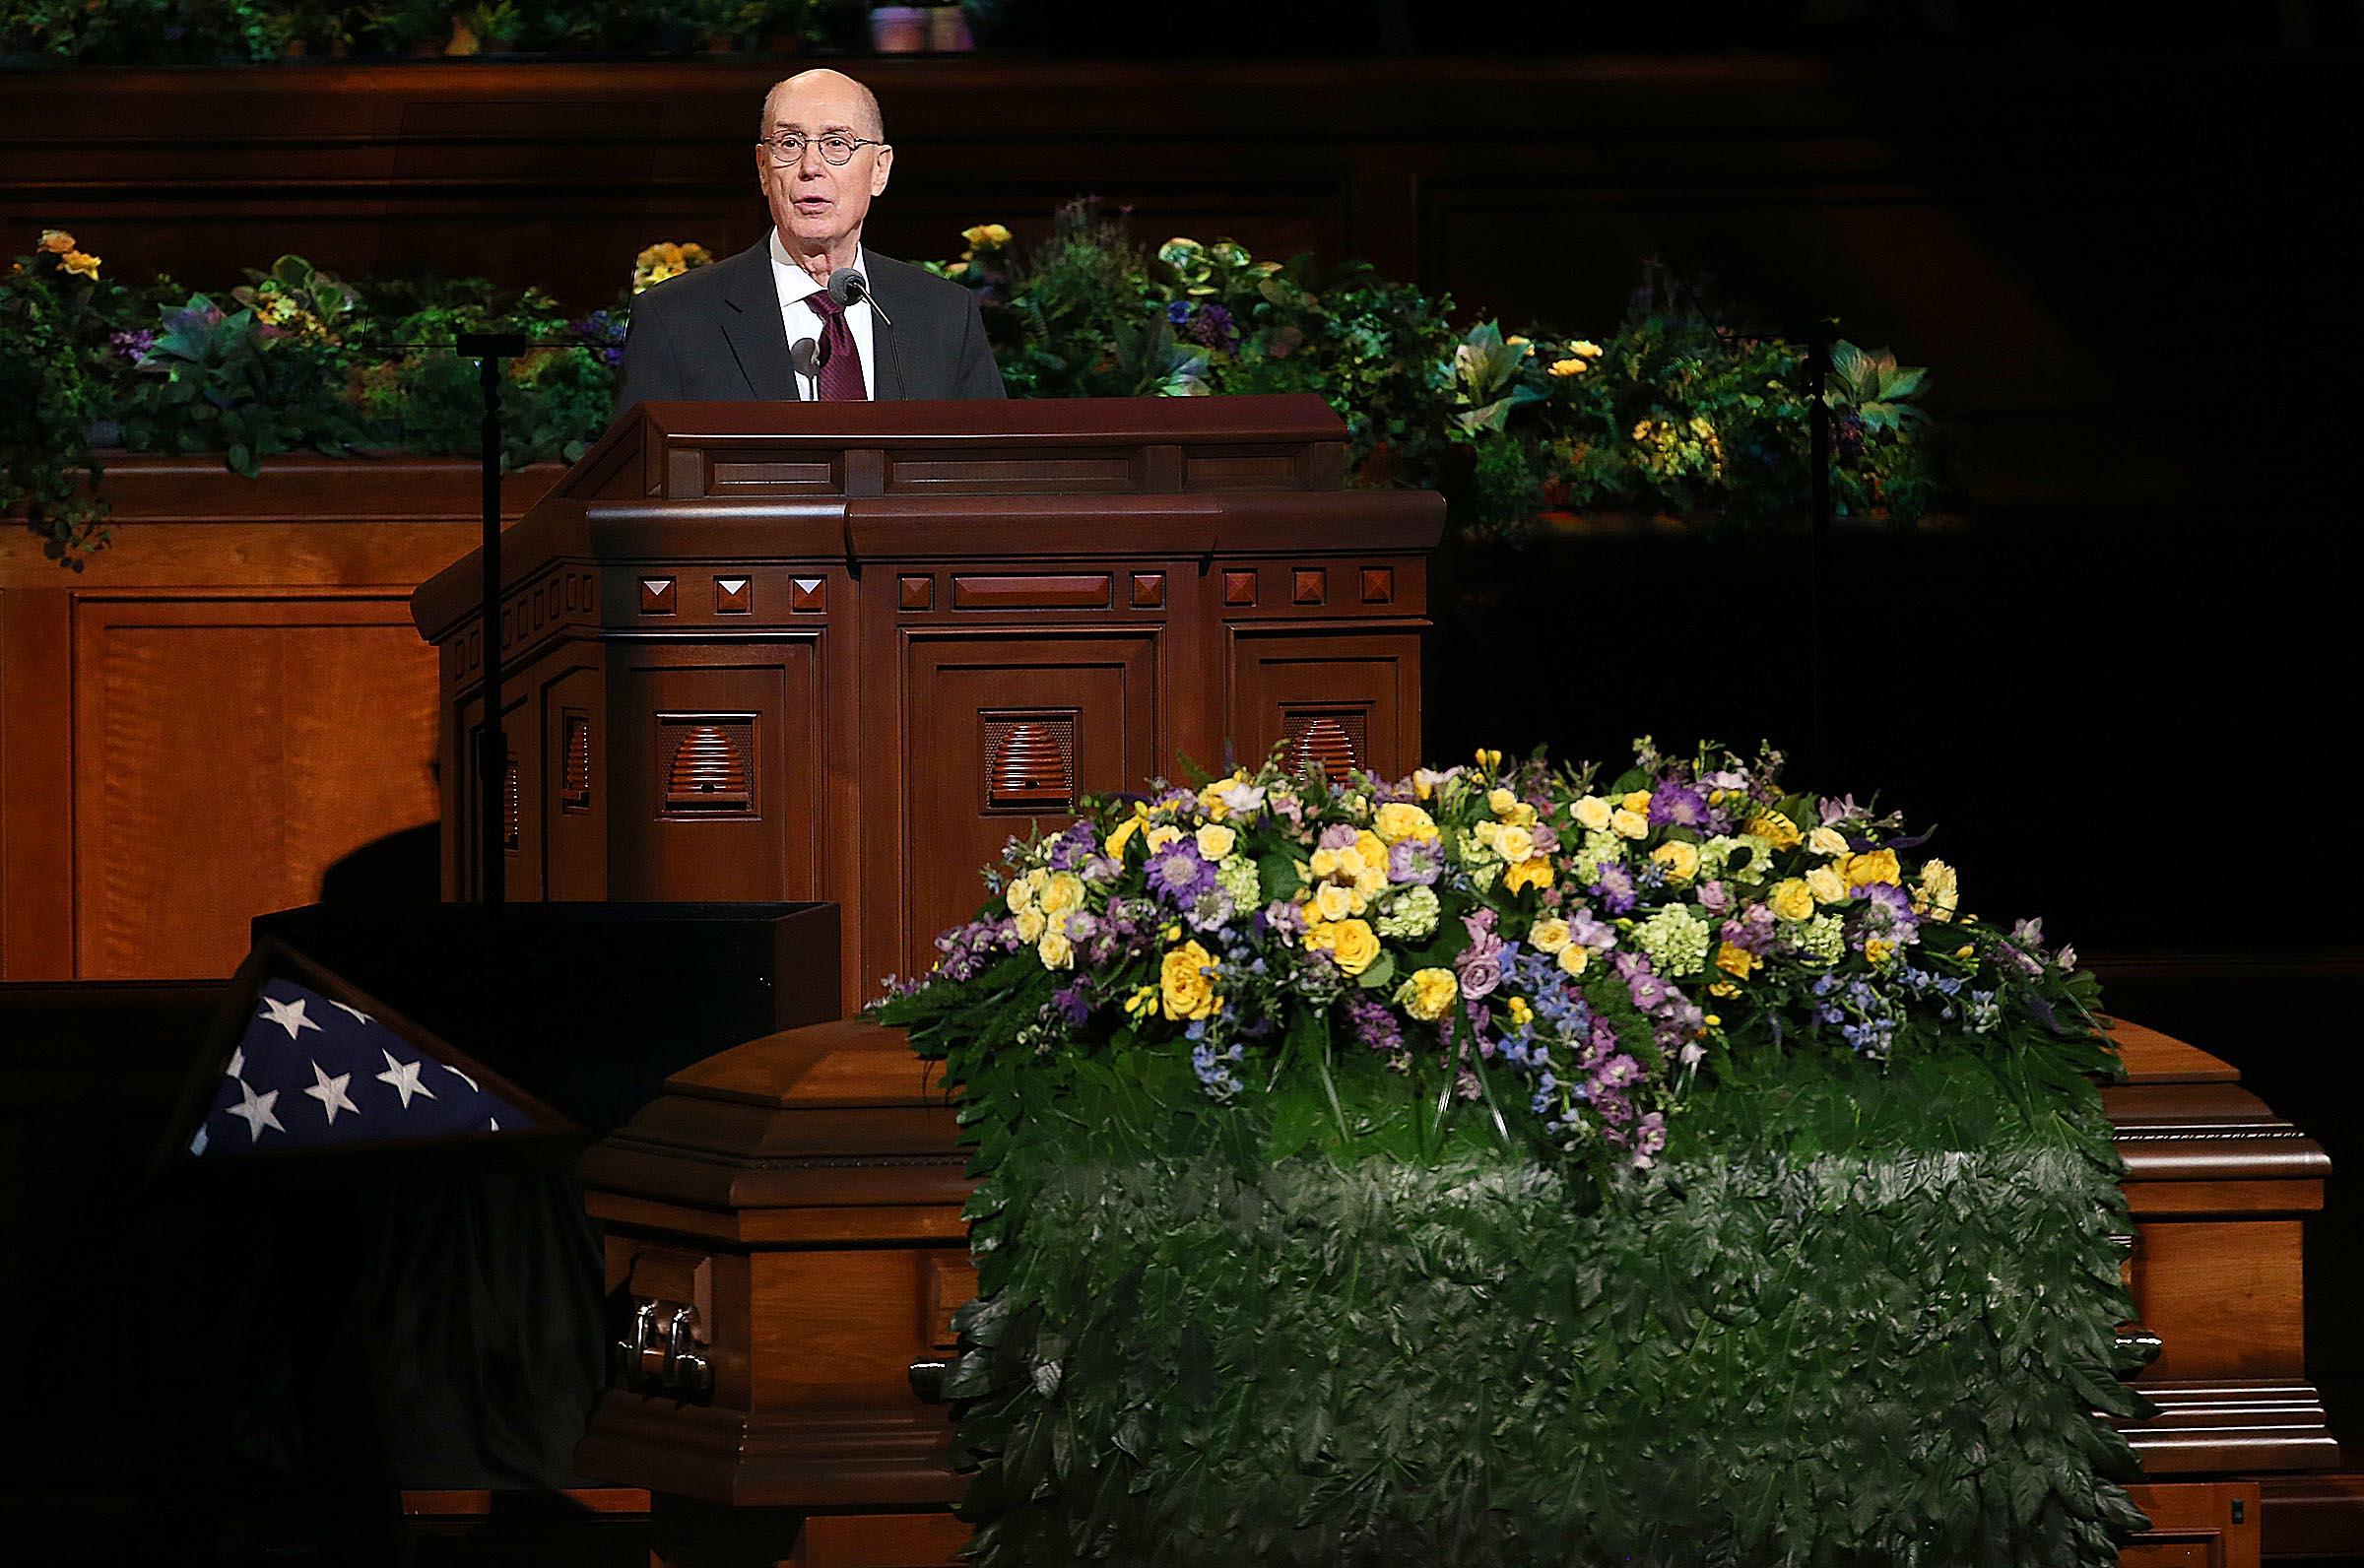 President Henry B. Eyring speaks at LDS Church President Thomas S. Monson's funeral at the Conference Center in Salt Lake City on Friday, Jan. 12, 2018. President Eyring was one of President Monson's counselors.